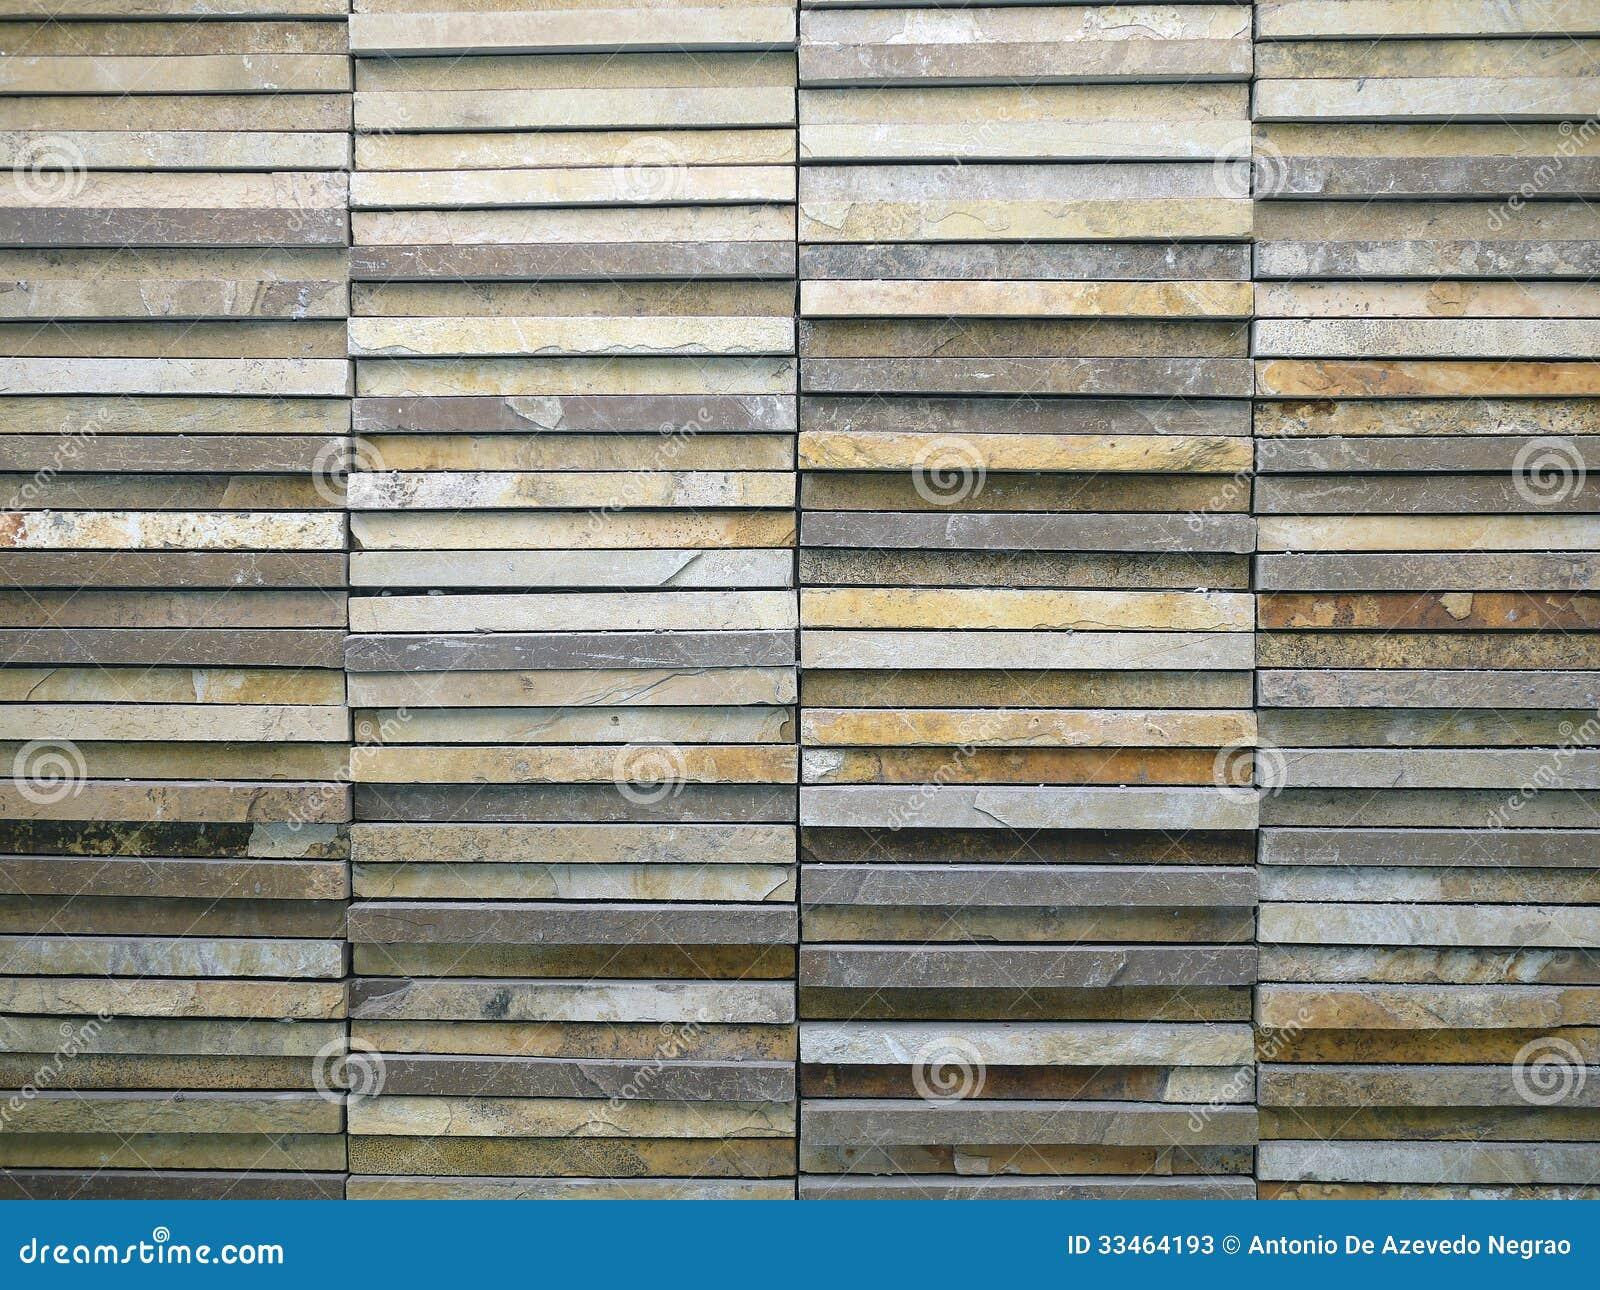 stone wall tiles stock photos image 33464193